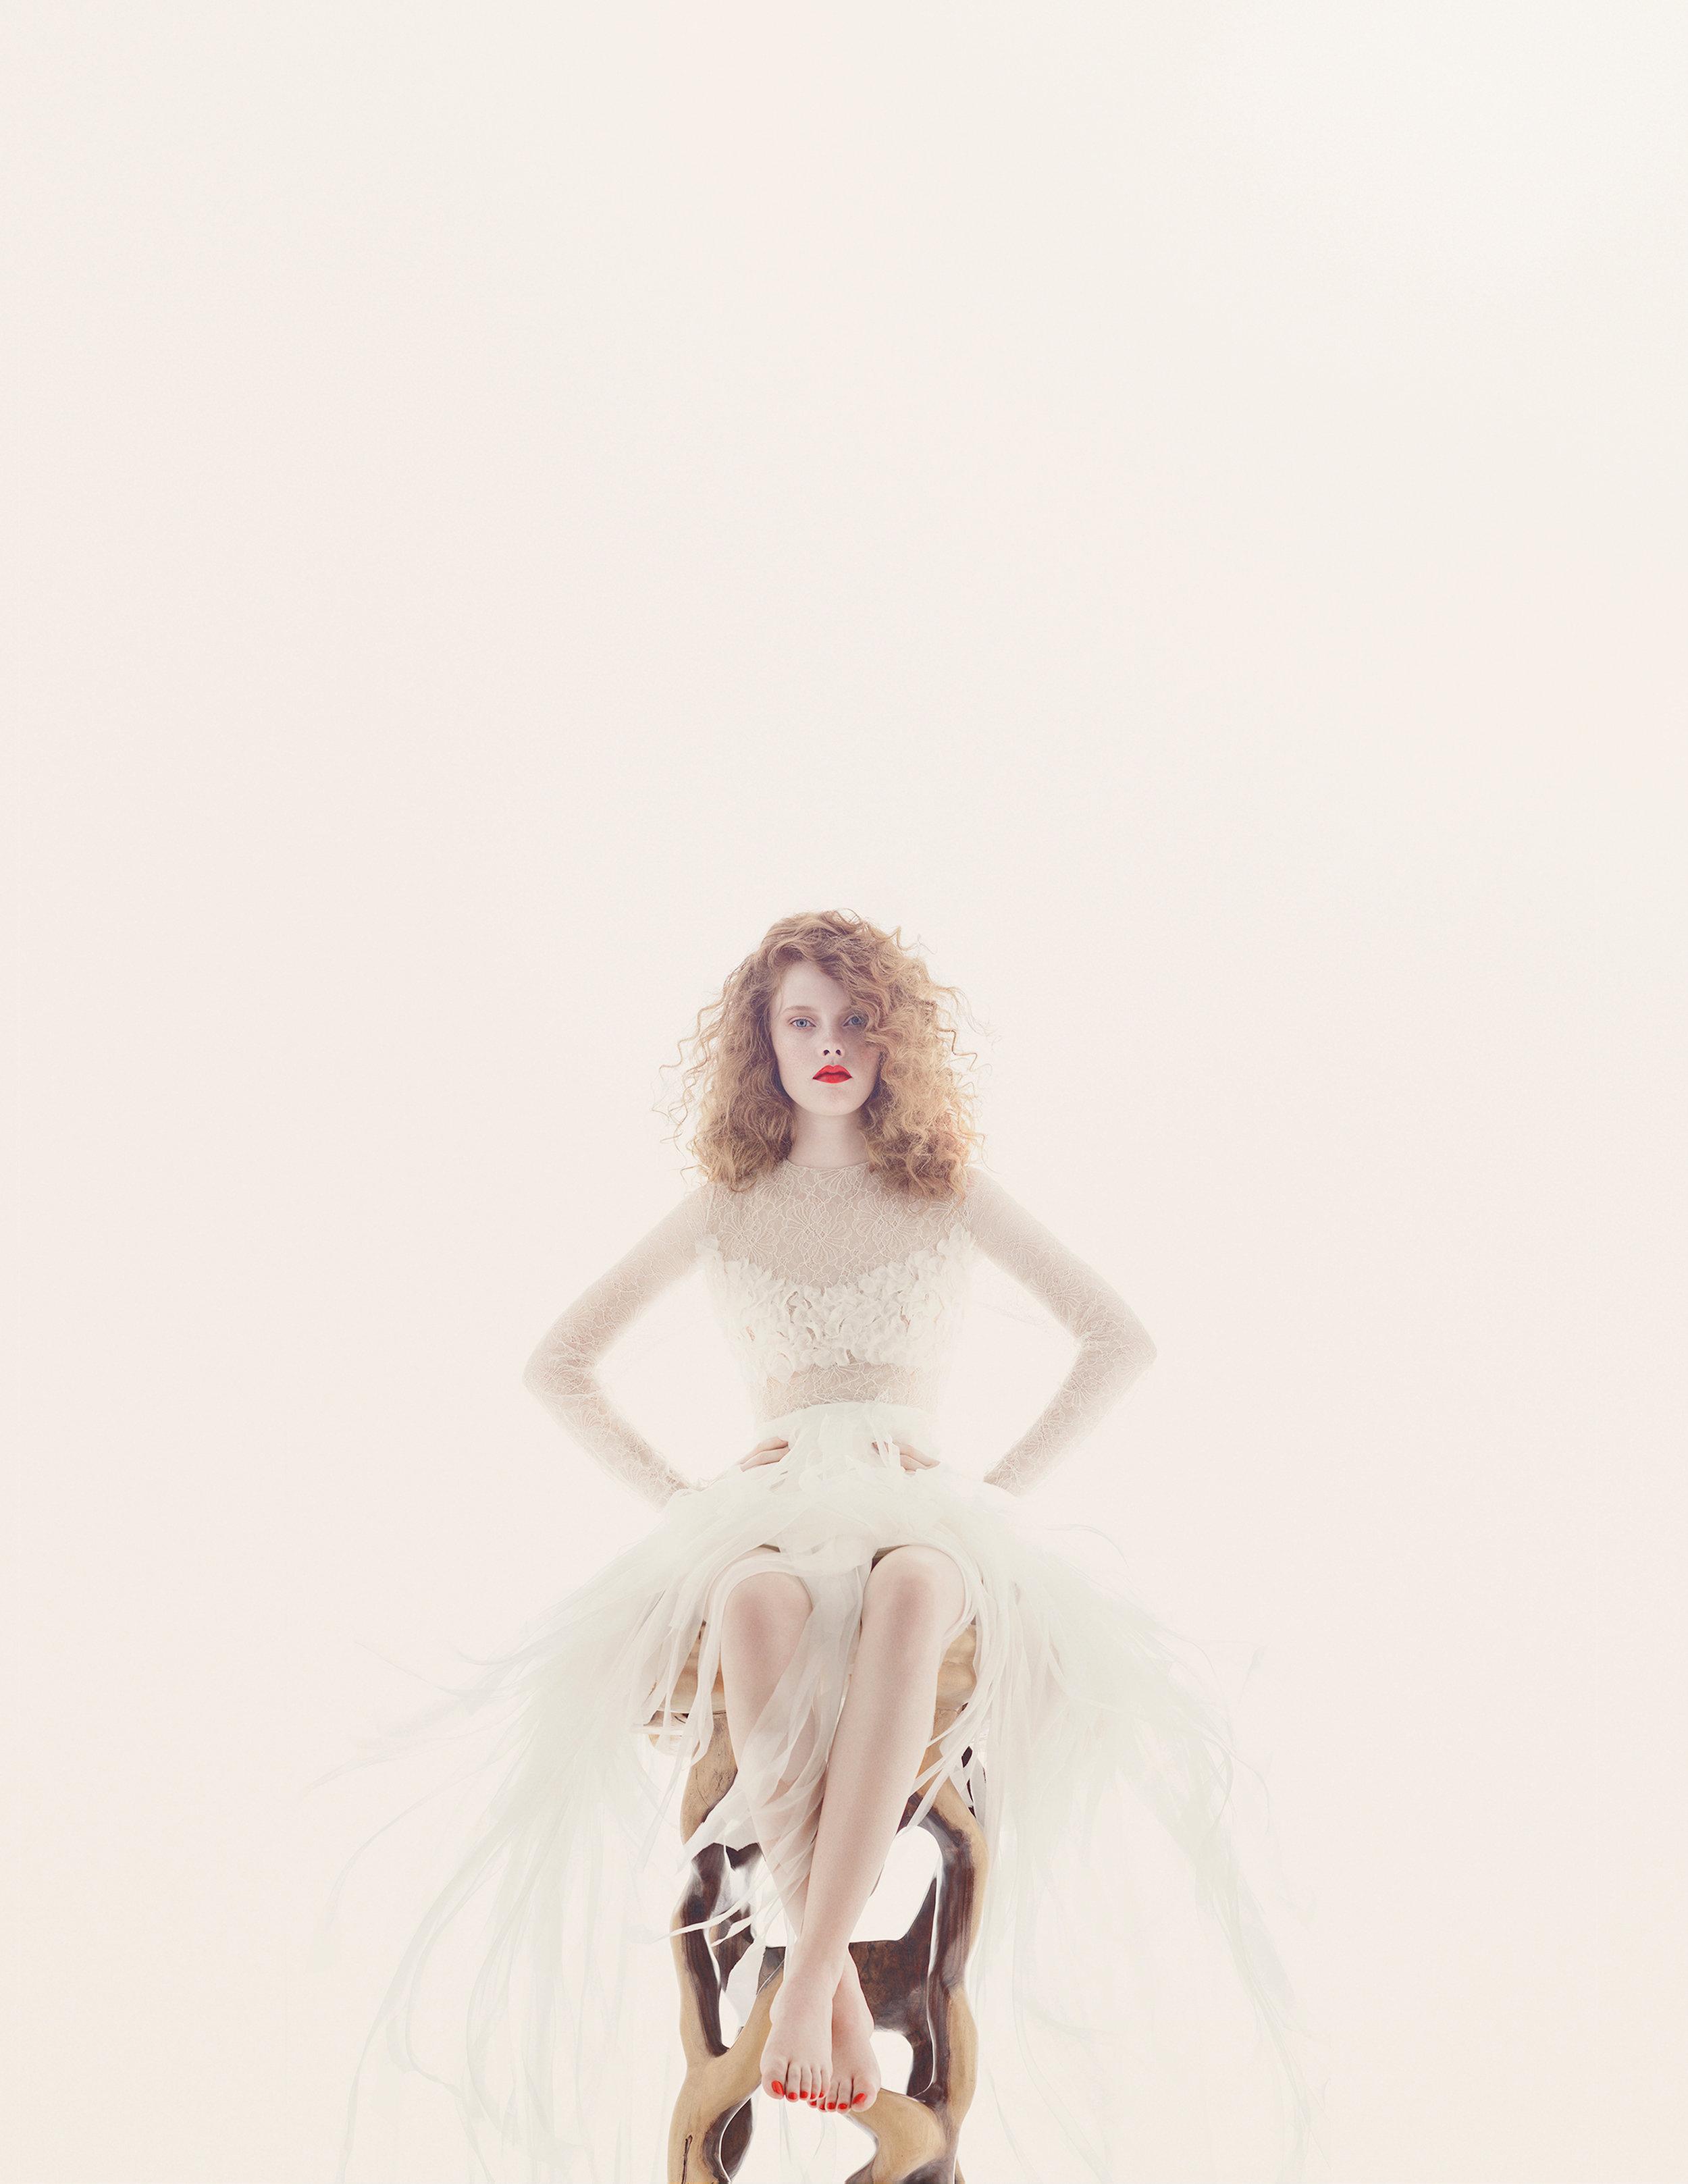 4-Emily-Bess-Marta-McAdams-Taylor-Greene-Atlas-Magazine.jpg